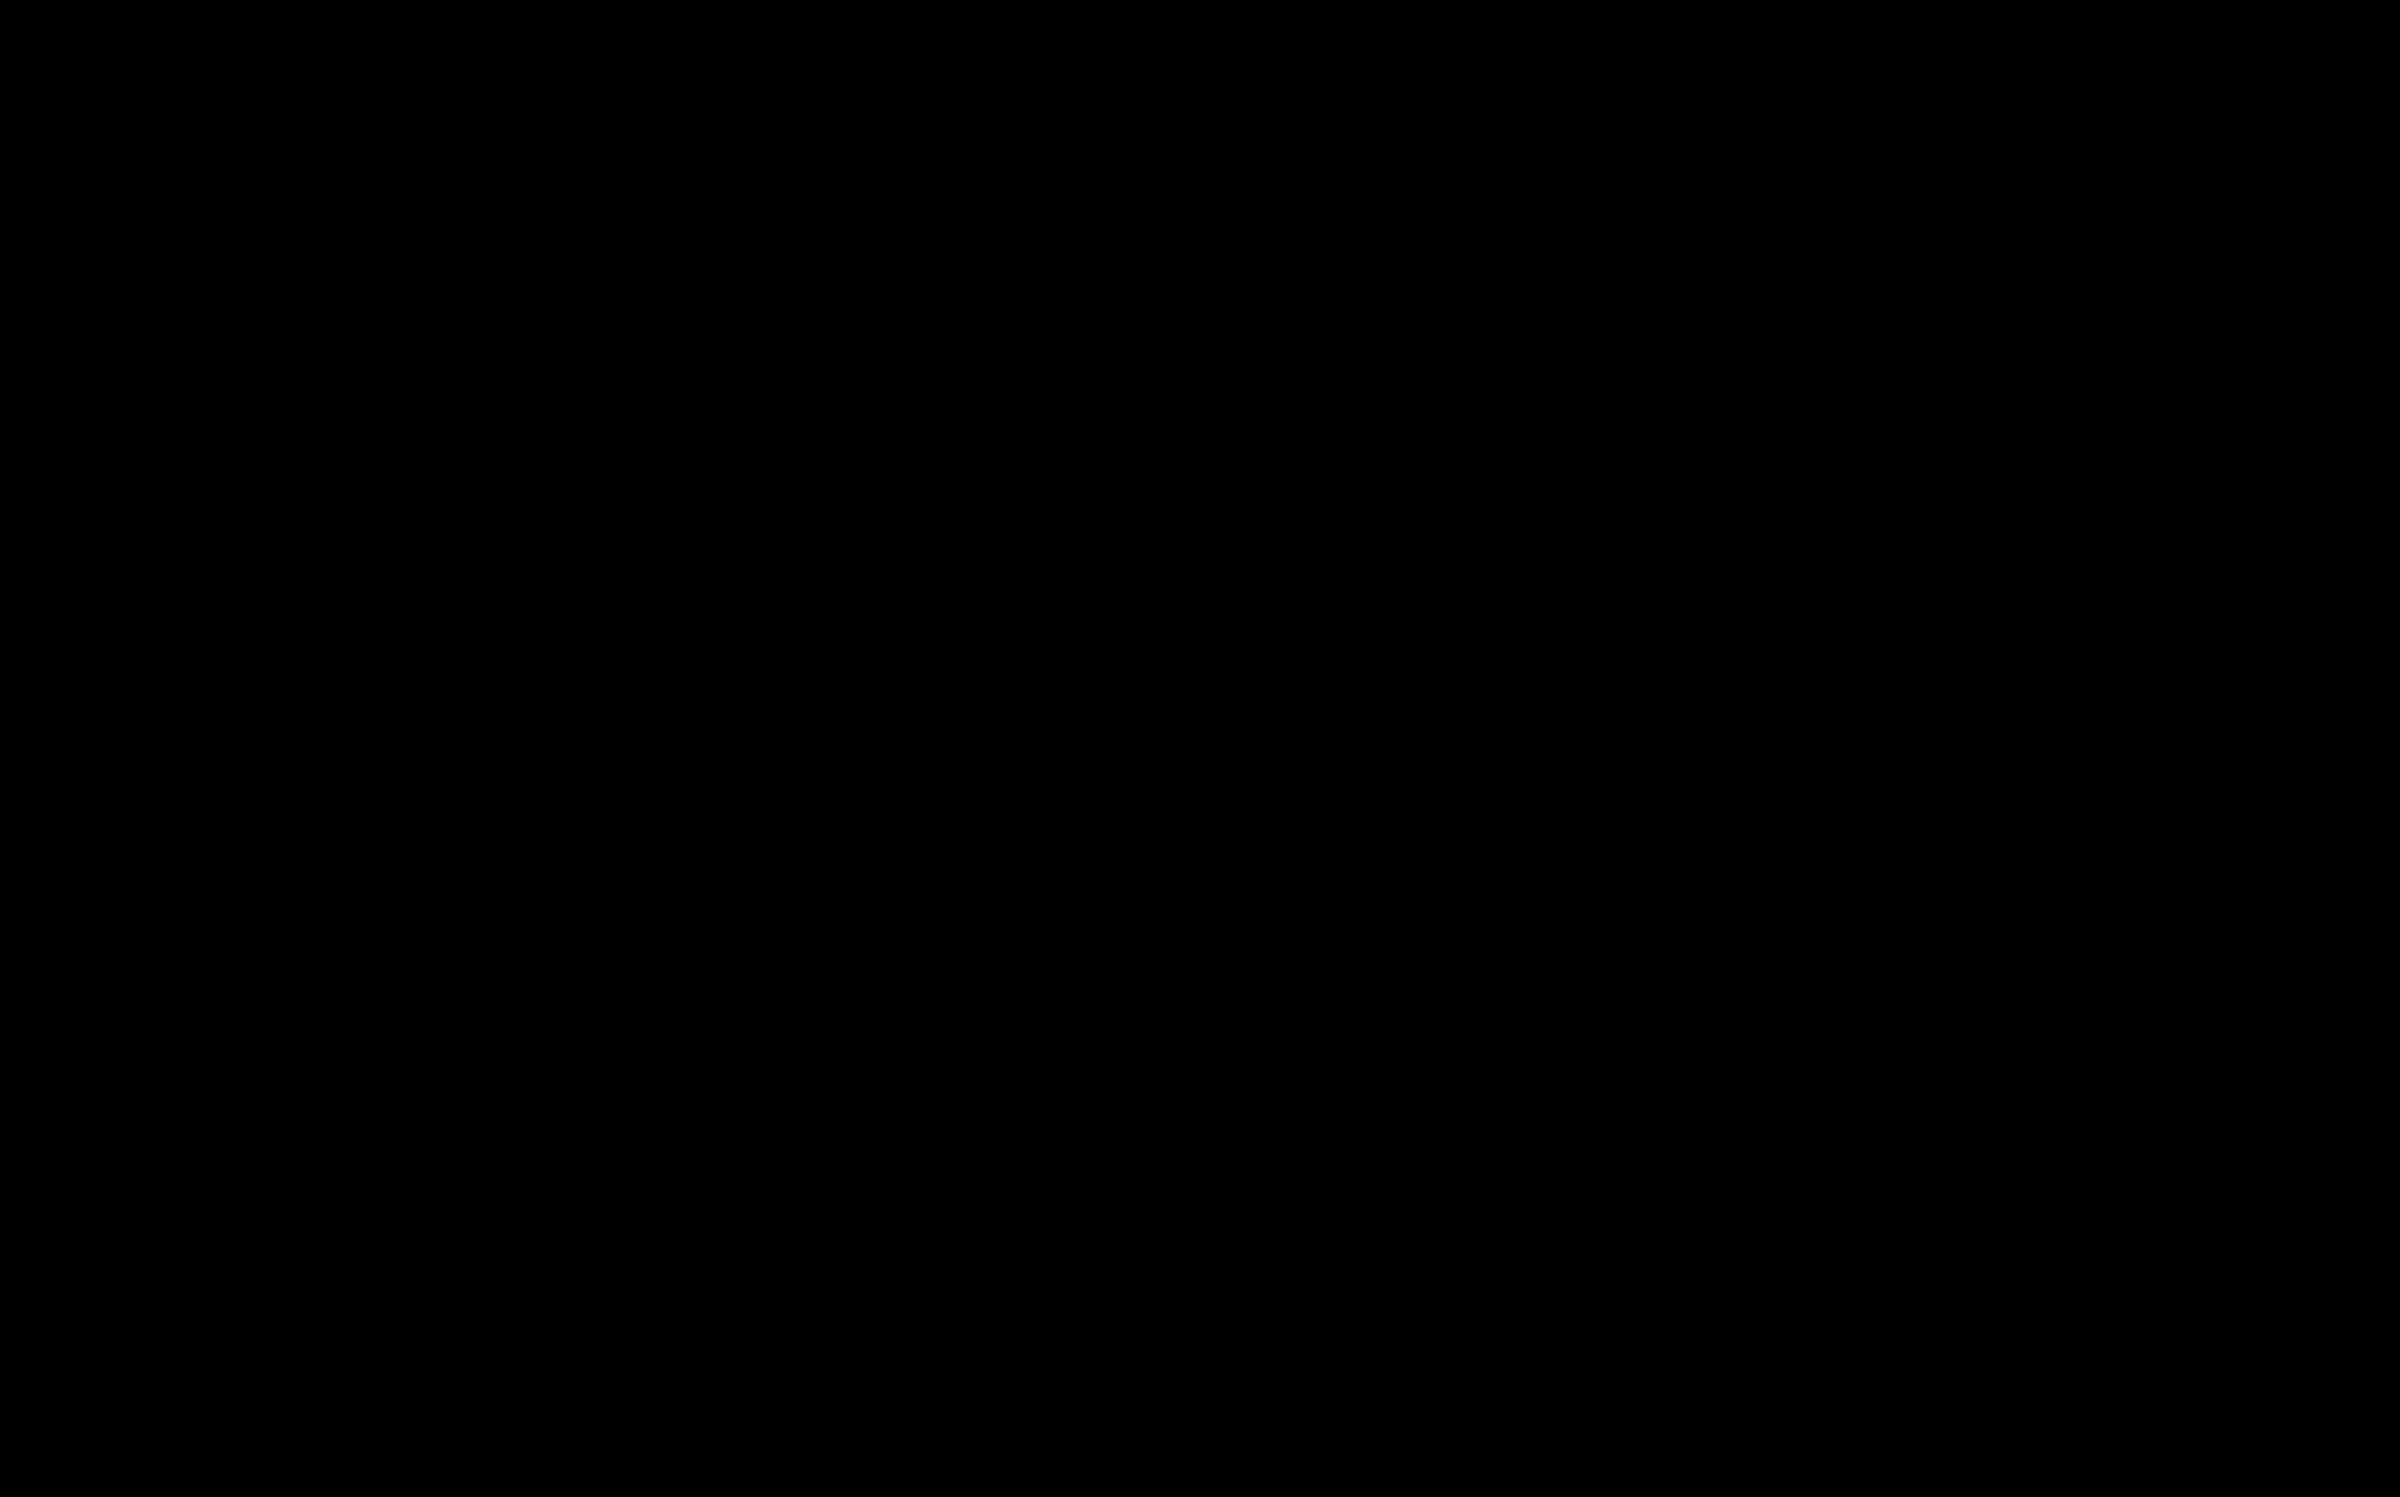 2400x1497 Silhouette